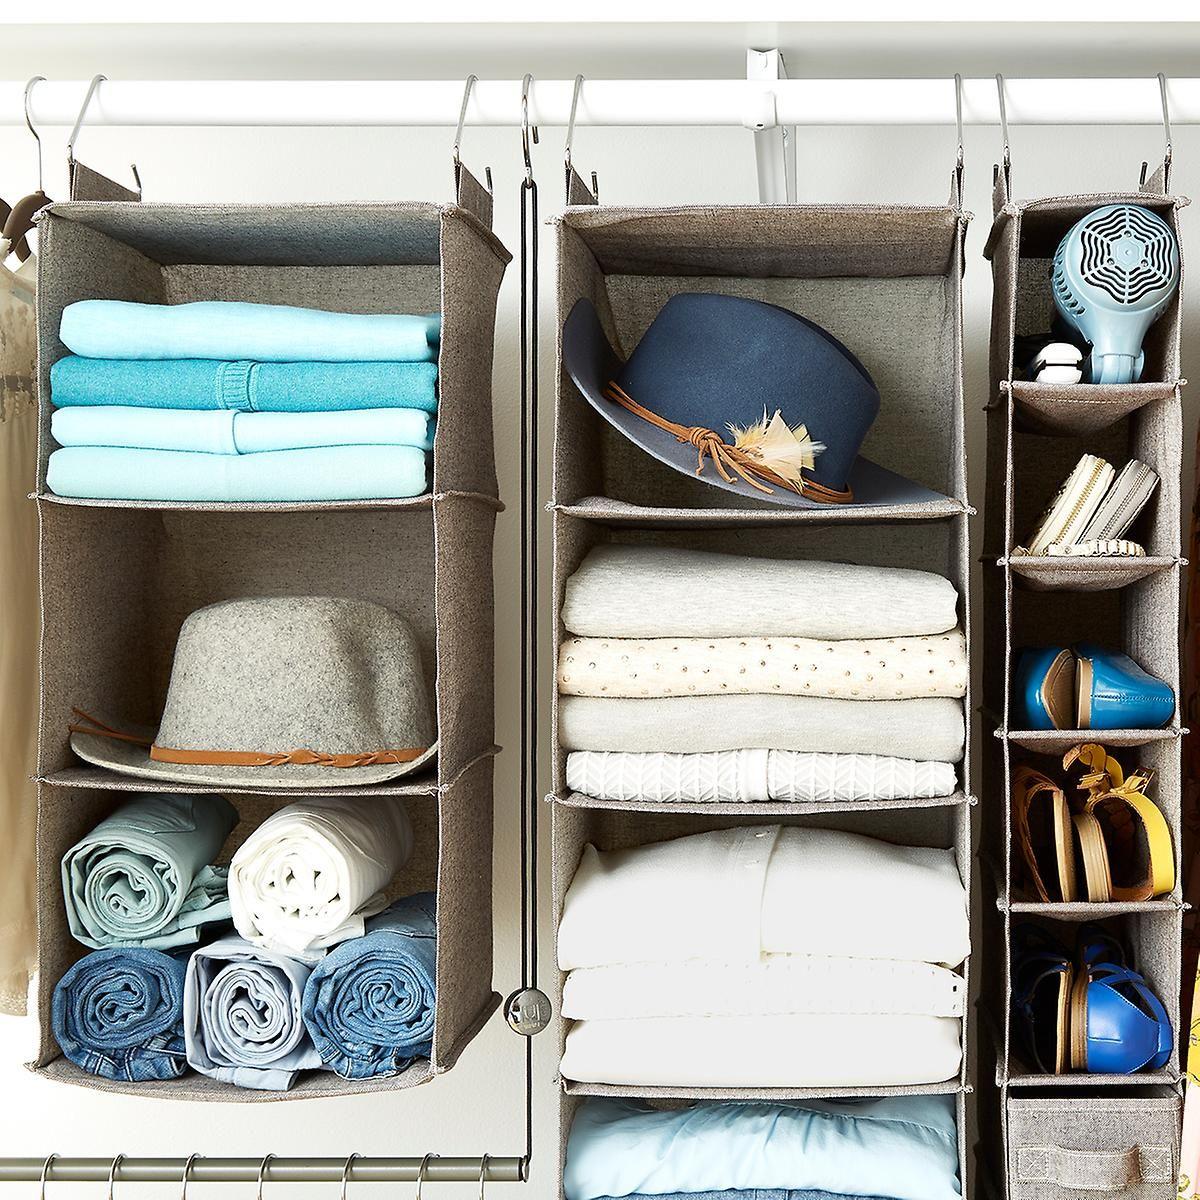 Merveilleux Grey 3 Compartment Hanging Sweater Organizer